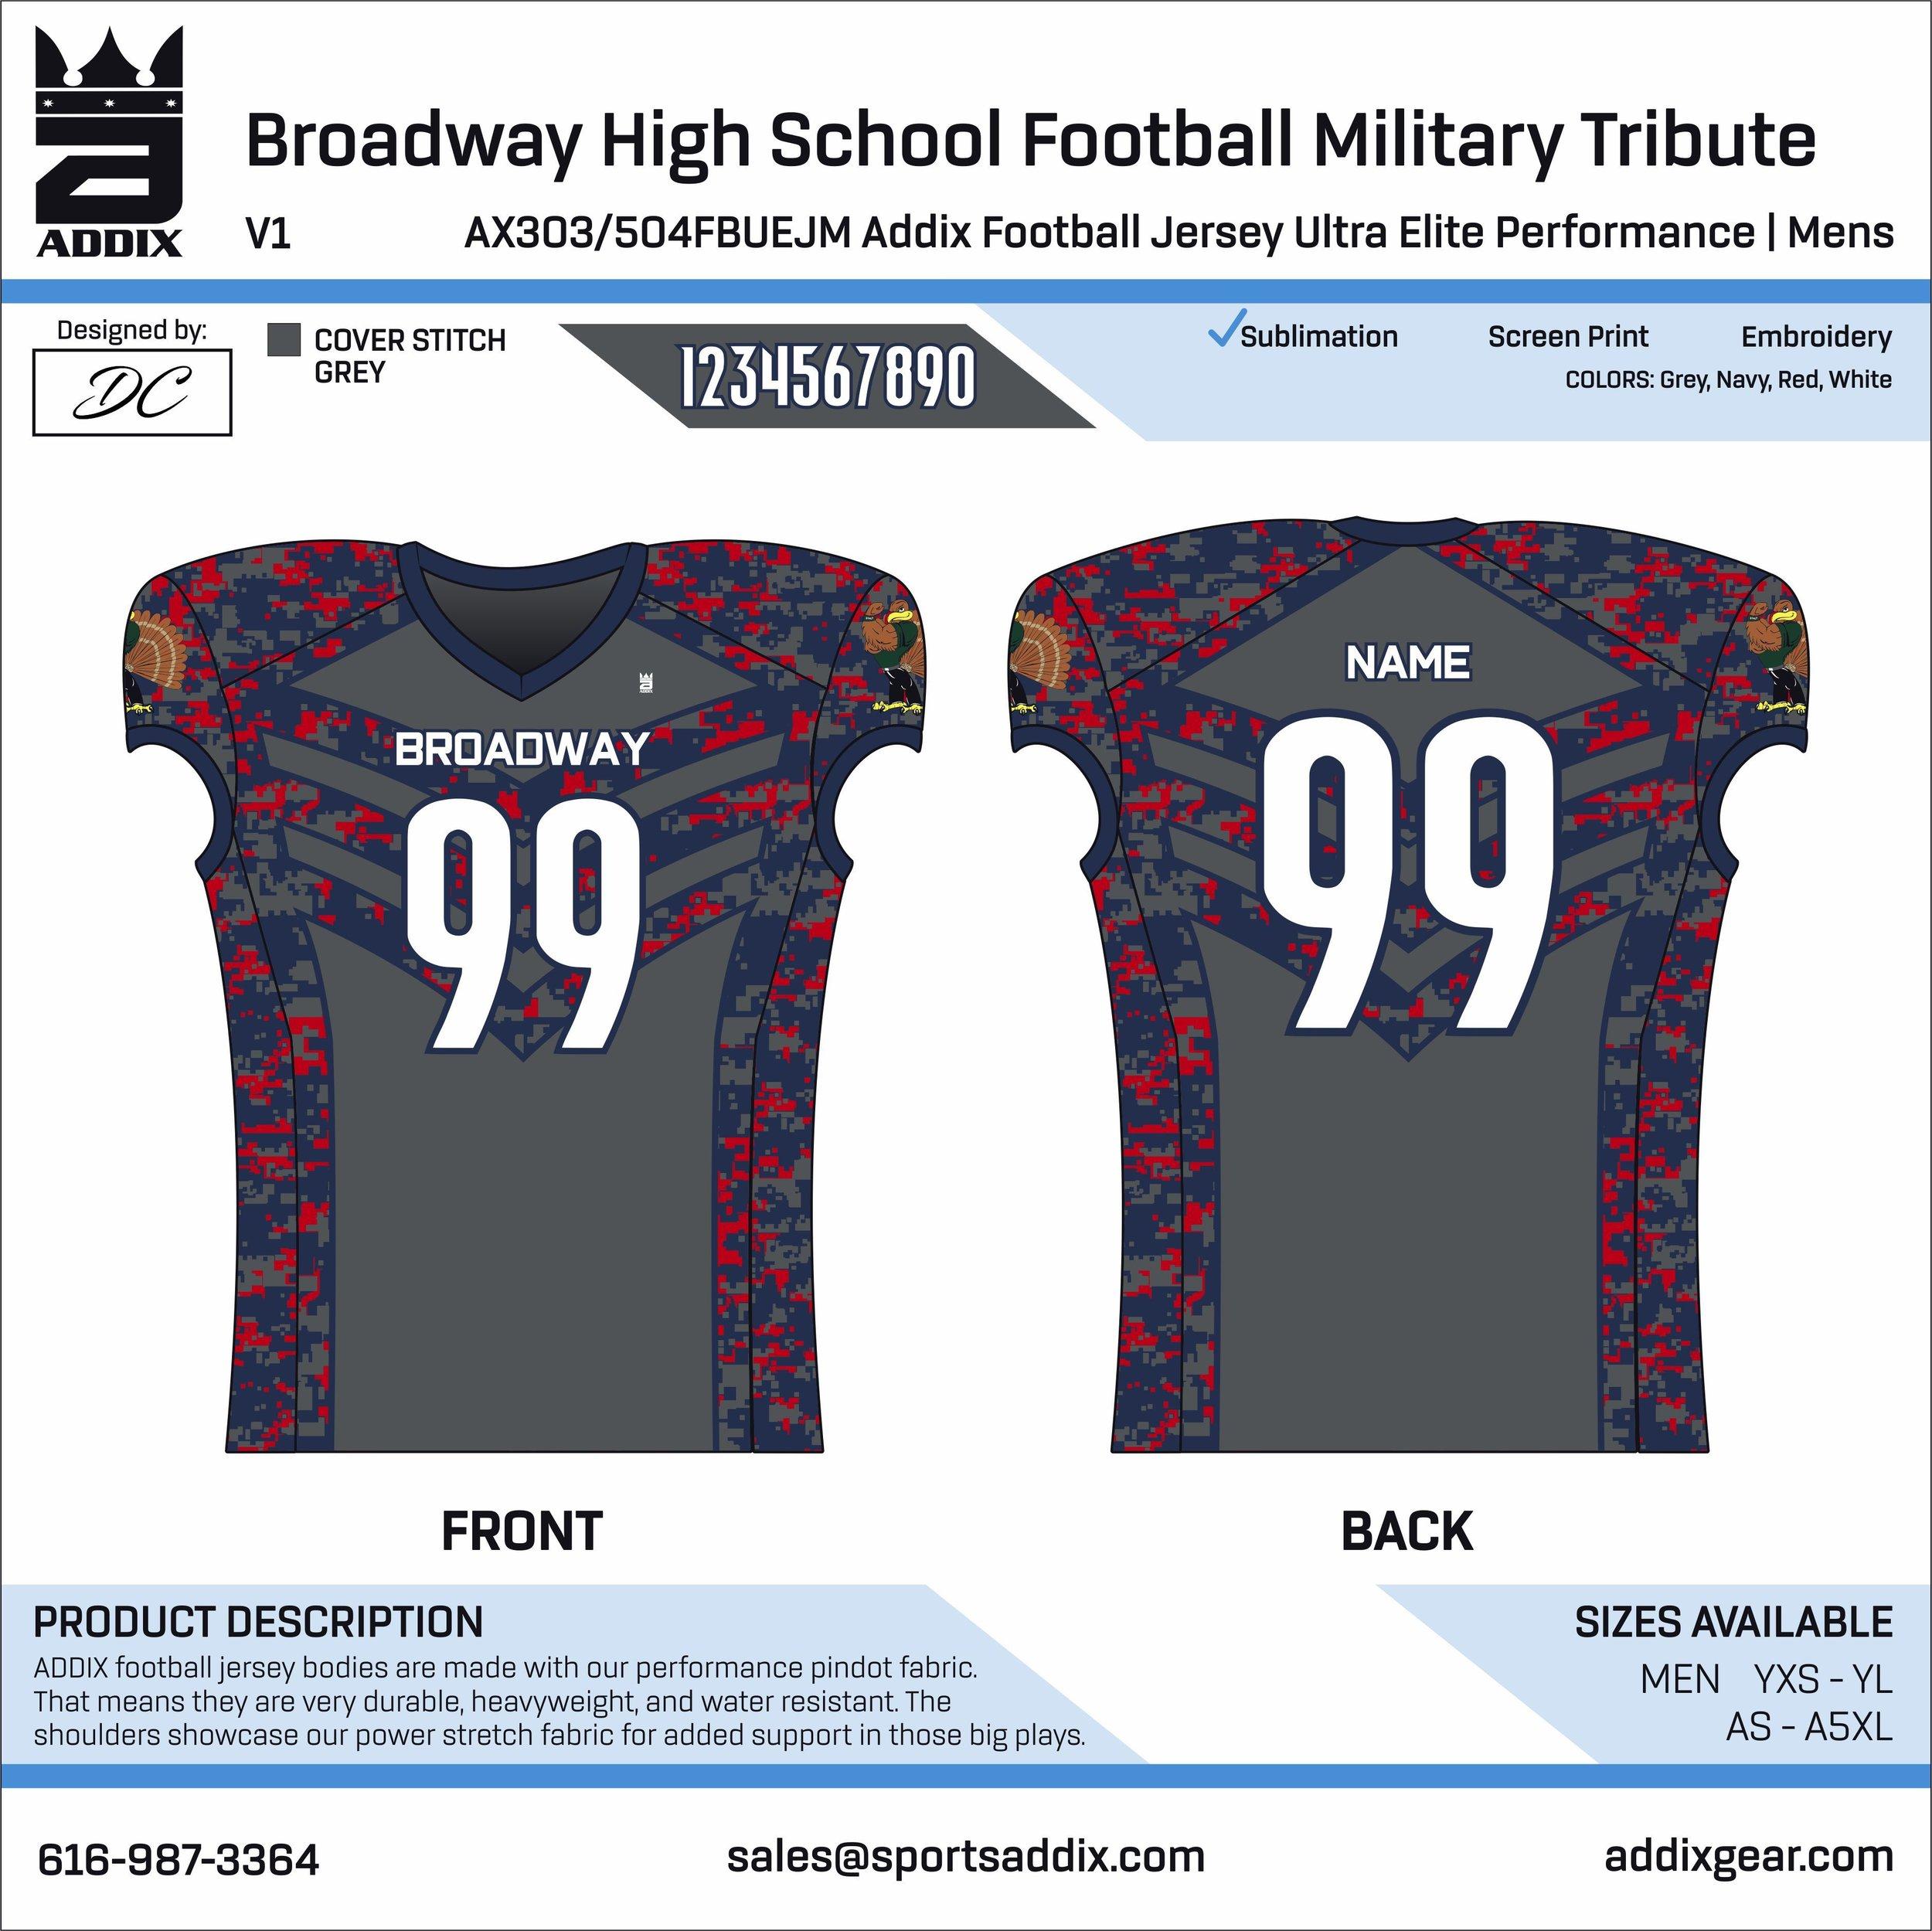 Broadway High School Football Military Tribute_2019_8-14_DC_UEP Jersey.jpg